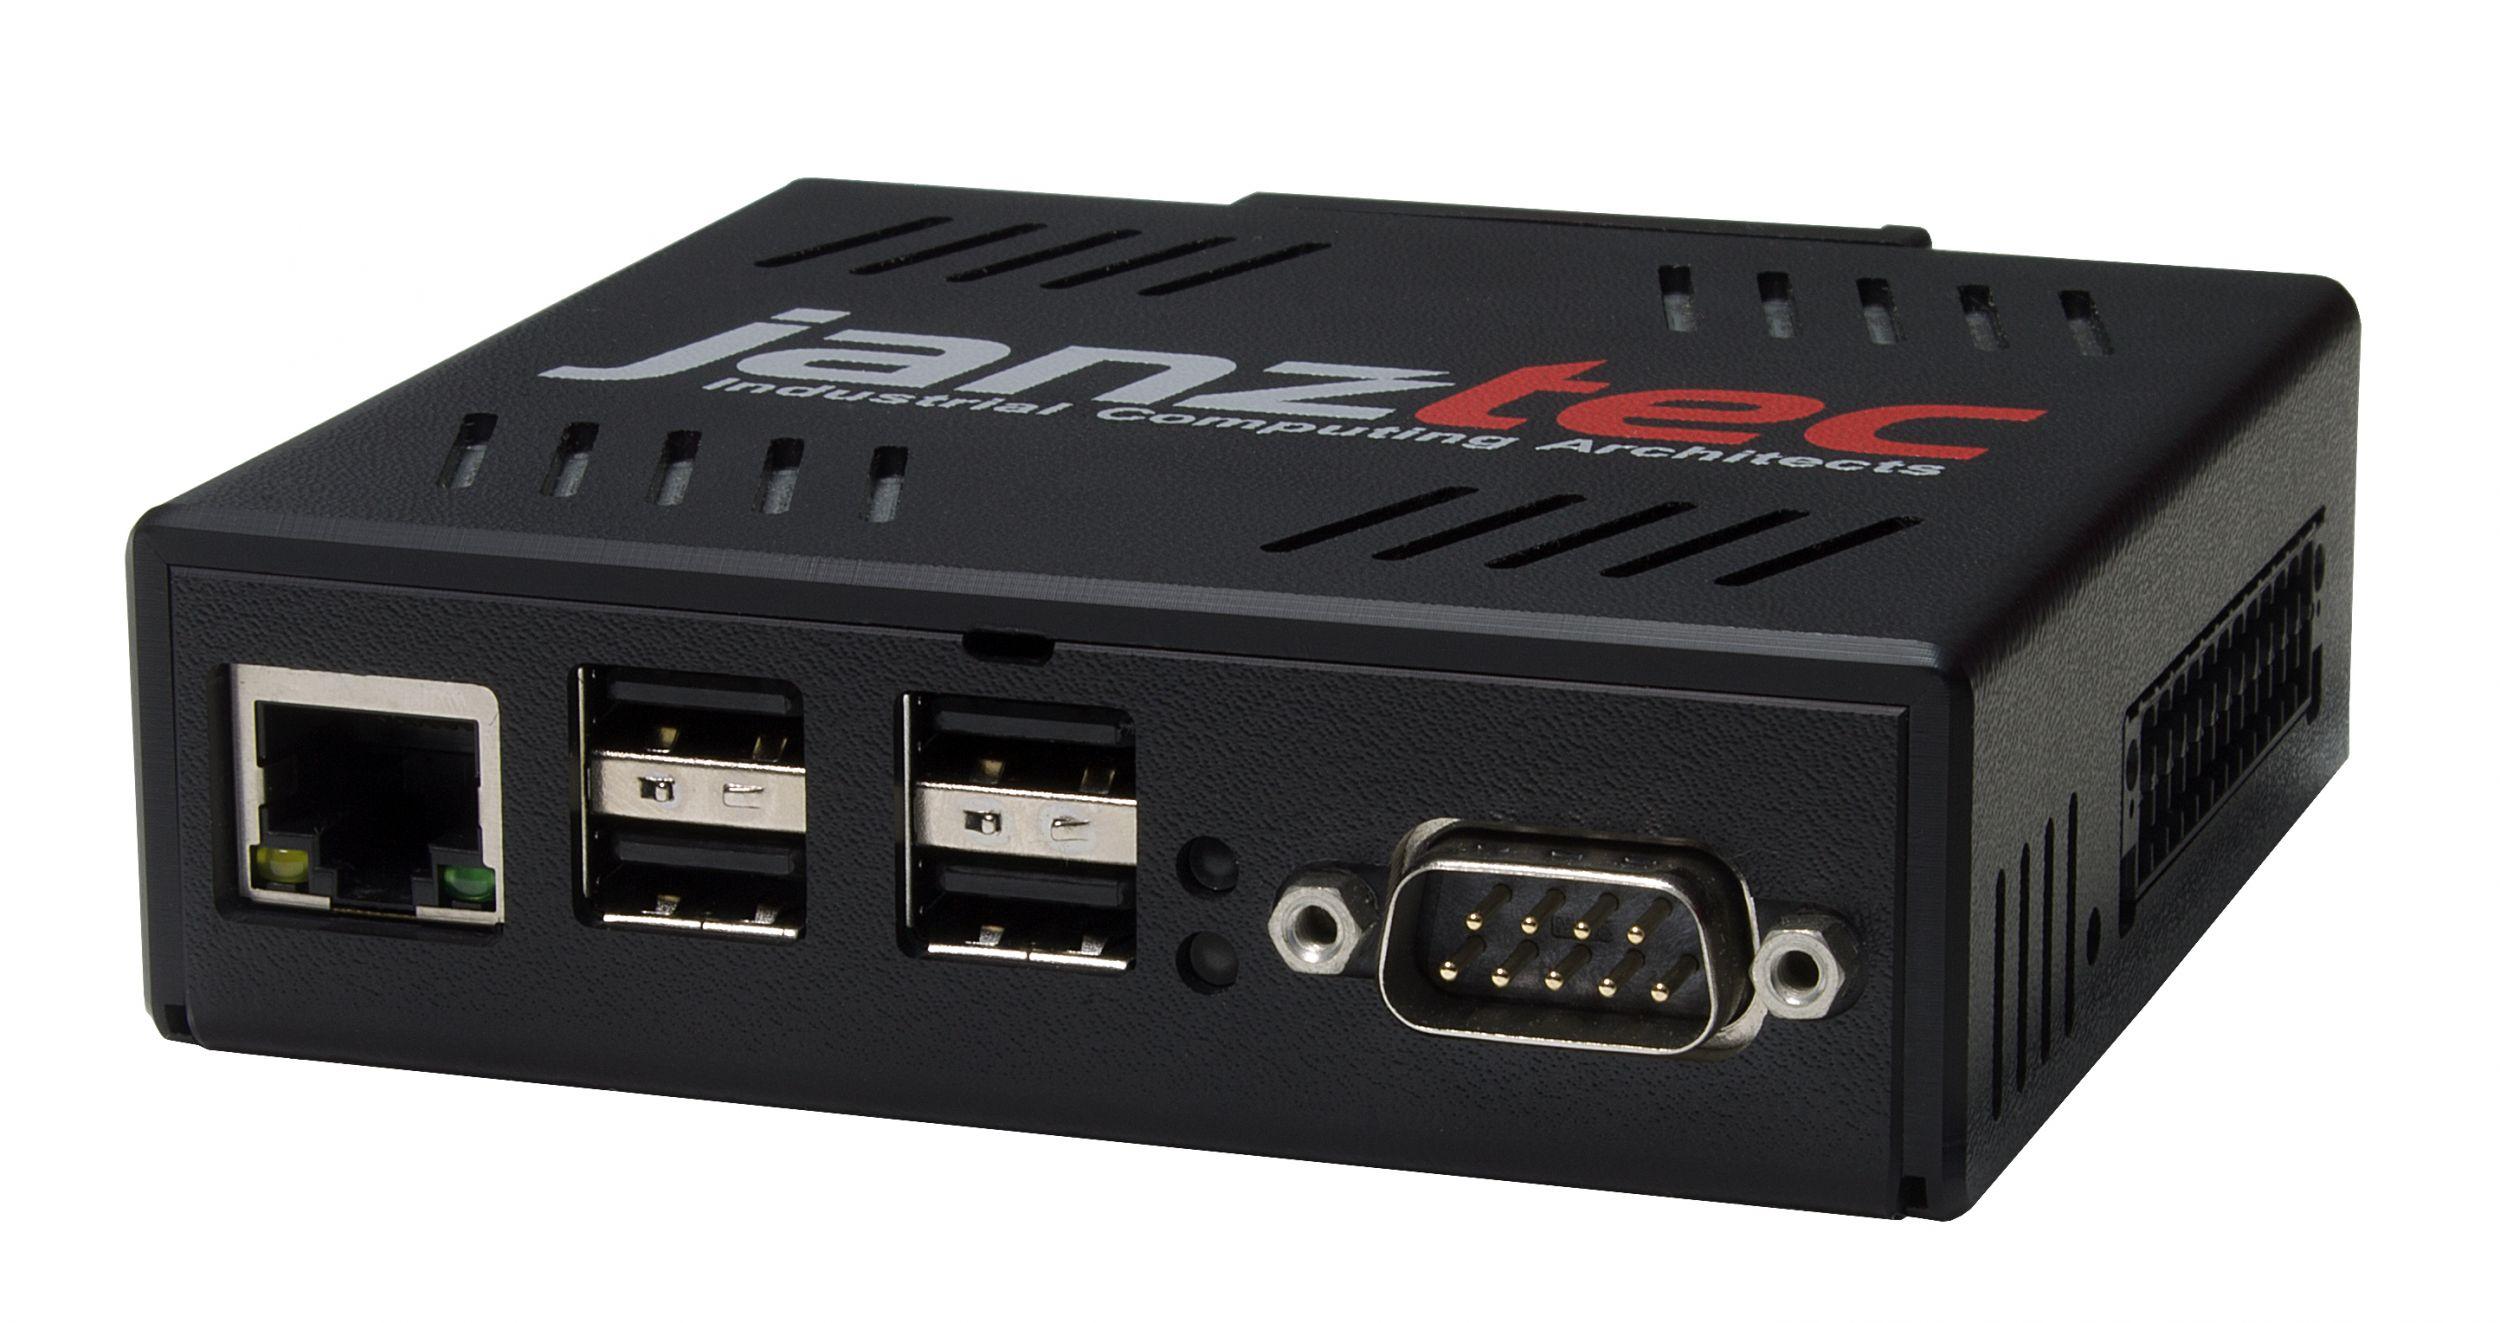 Embedded System basierend auf dem Raspberry Pi 3